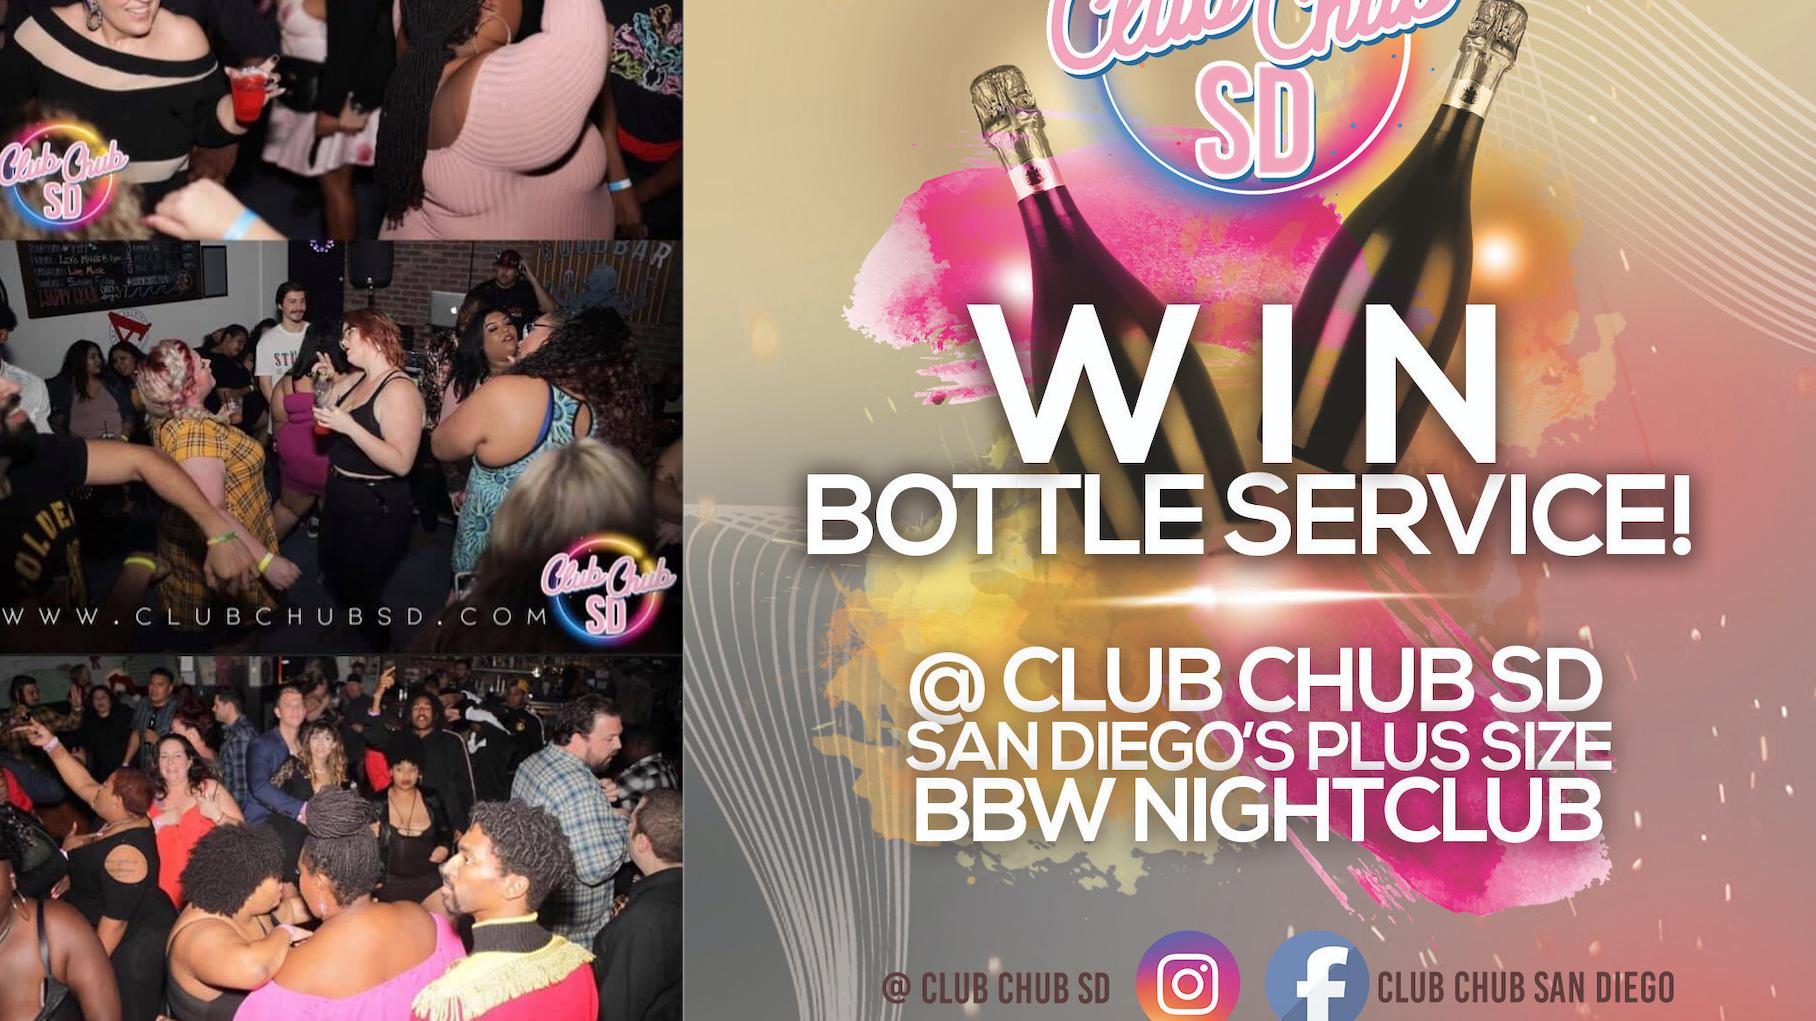 Mujeres Bbw club chub san diego- plus size bbw nightclub (san diego, ca